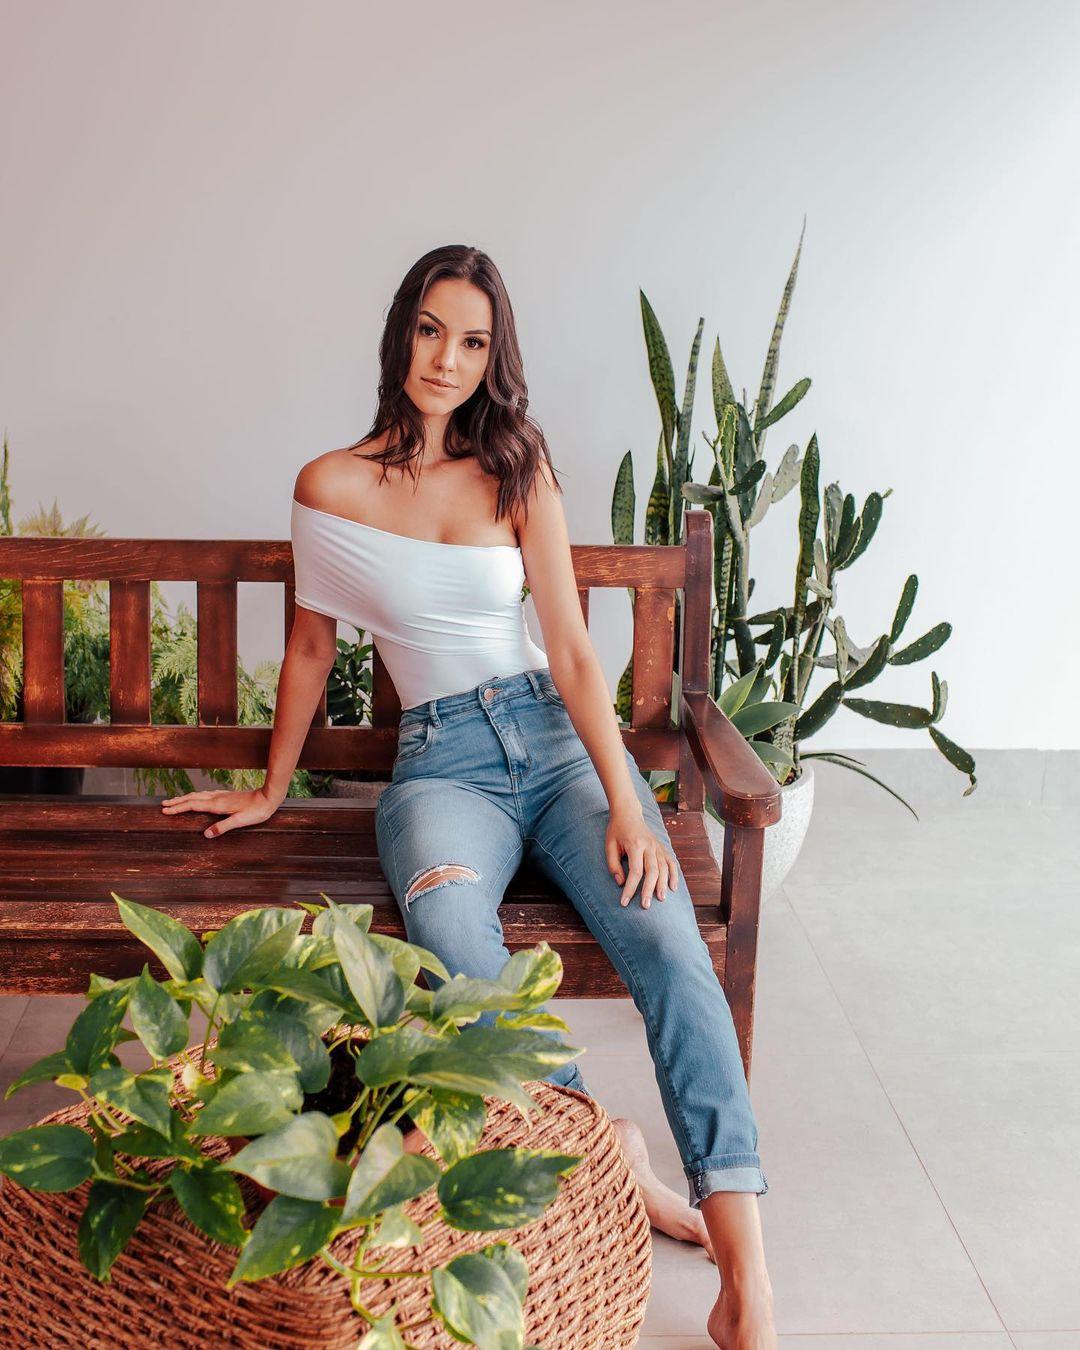 rafaella felipe, top 20 de miss brasil mundo 2019. - Página 3 Qtd3nj10